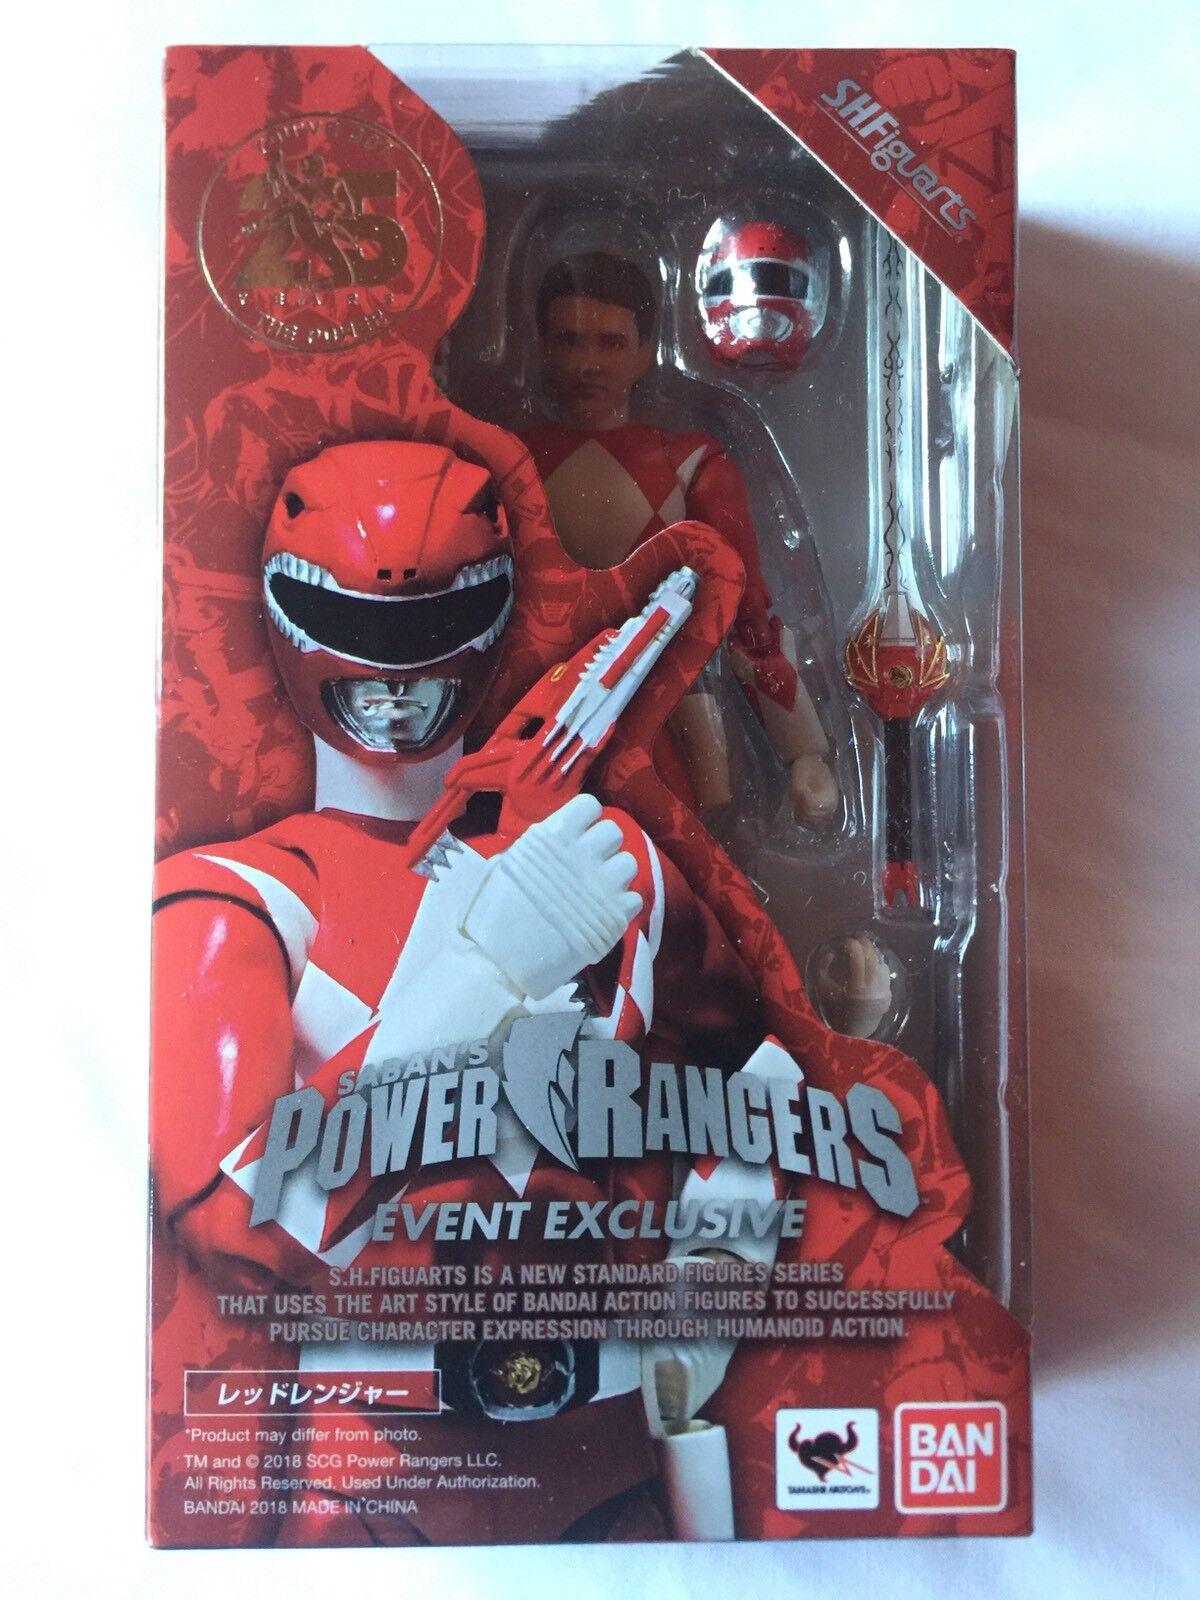 SDCC 2018 MMPR Power Rangers S.H. Figuarts ROT Ranger Figure NEW & MISB Tamashii